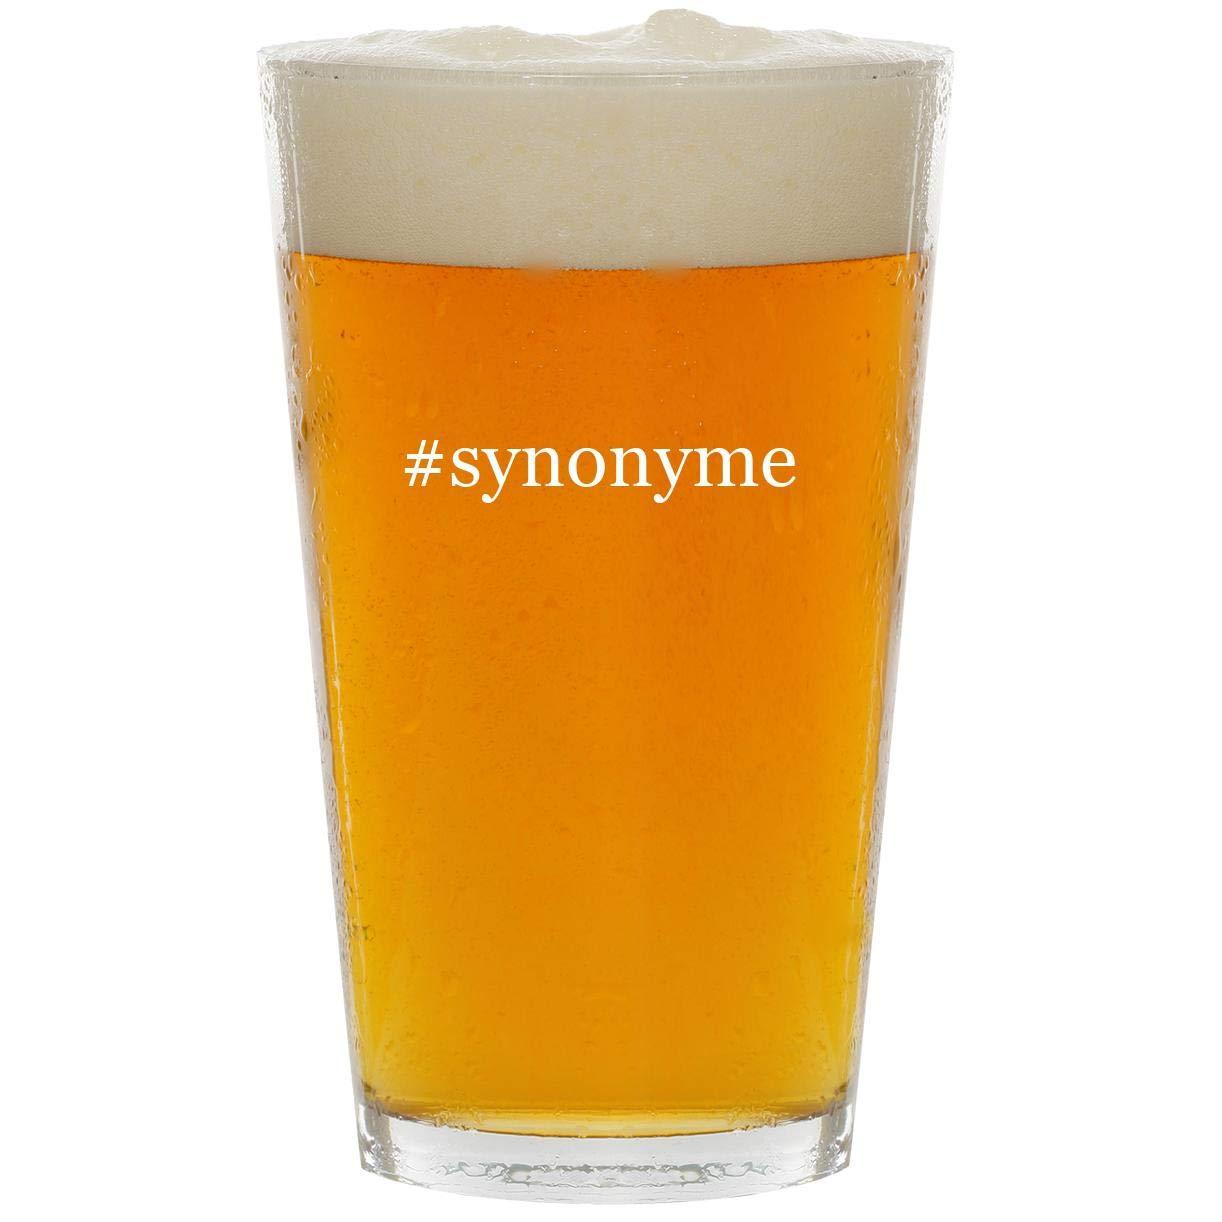 #synonyme - Glass Hashtag 16oz Beer Pint